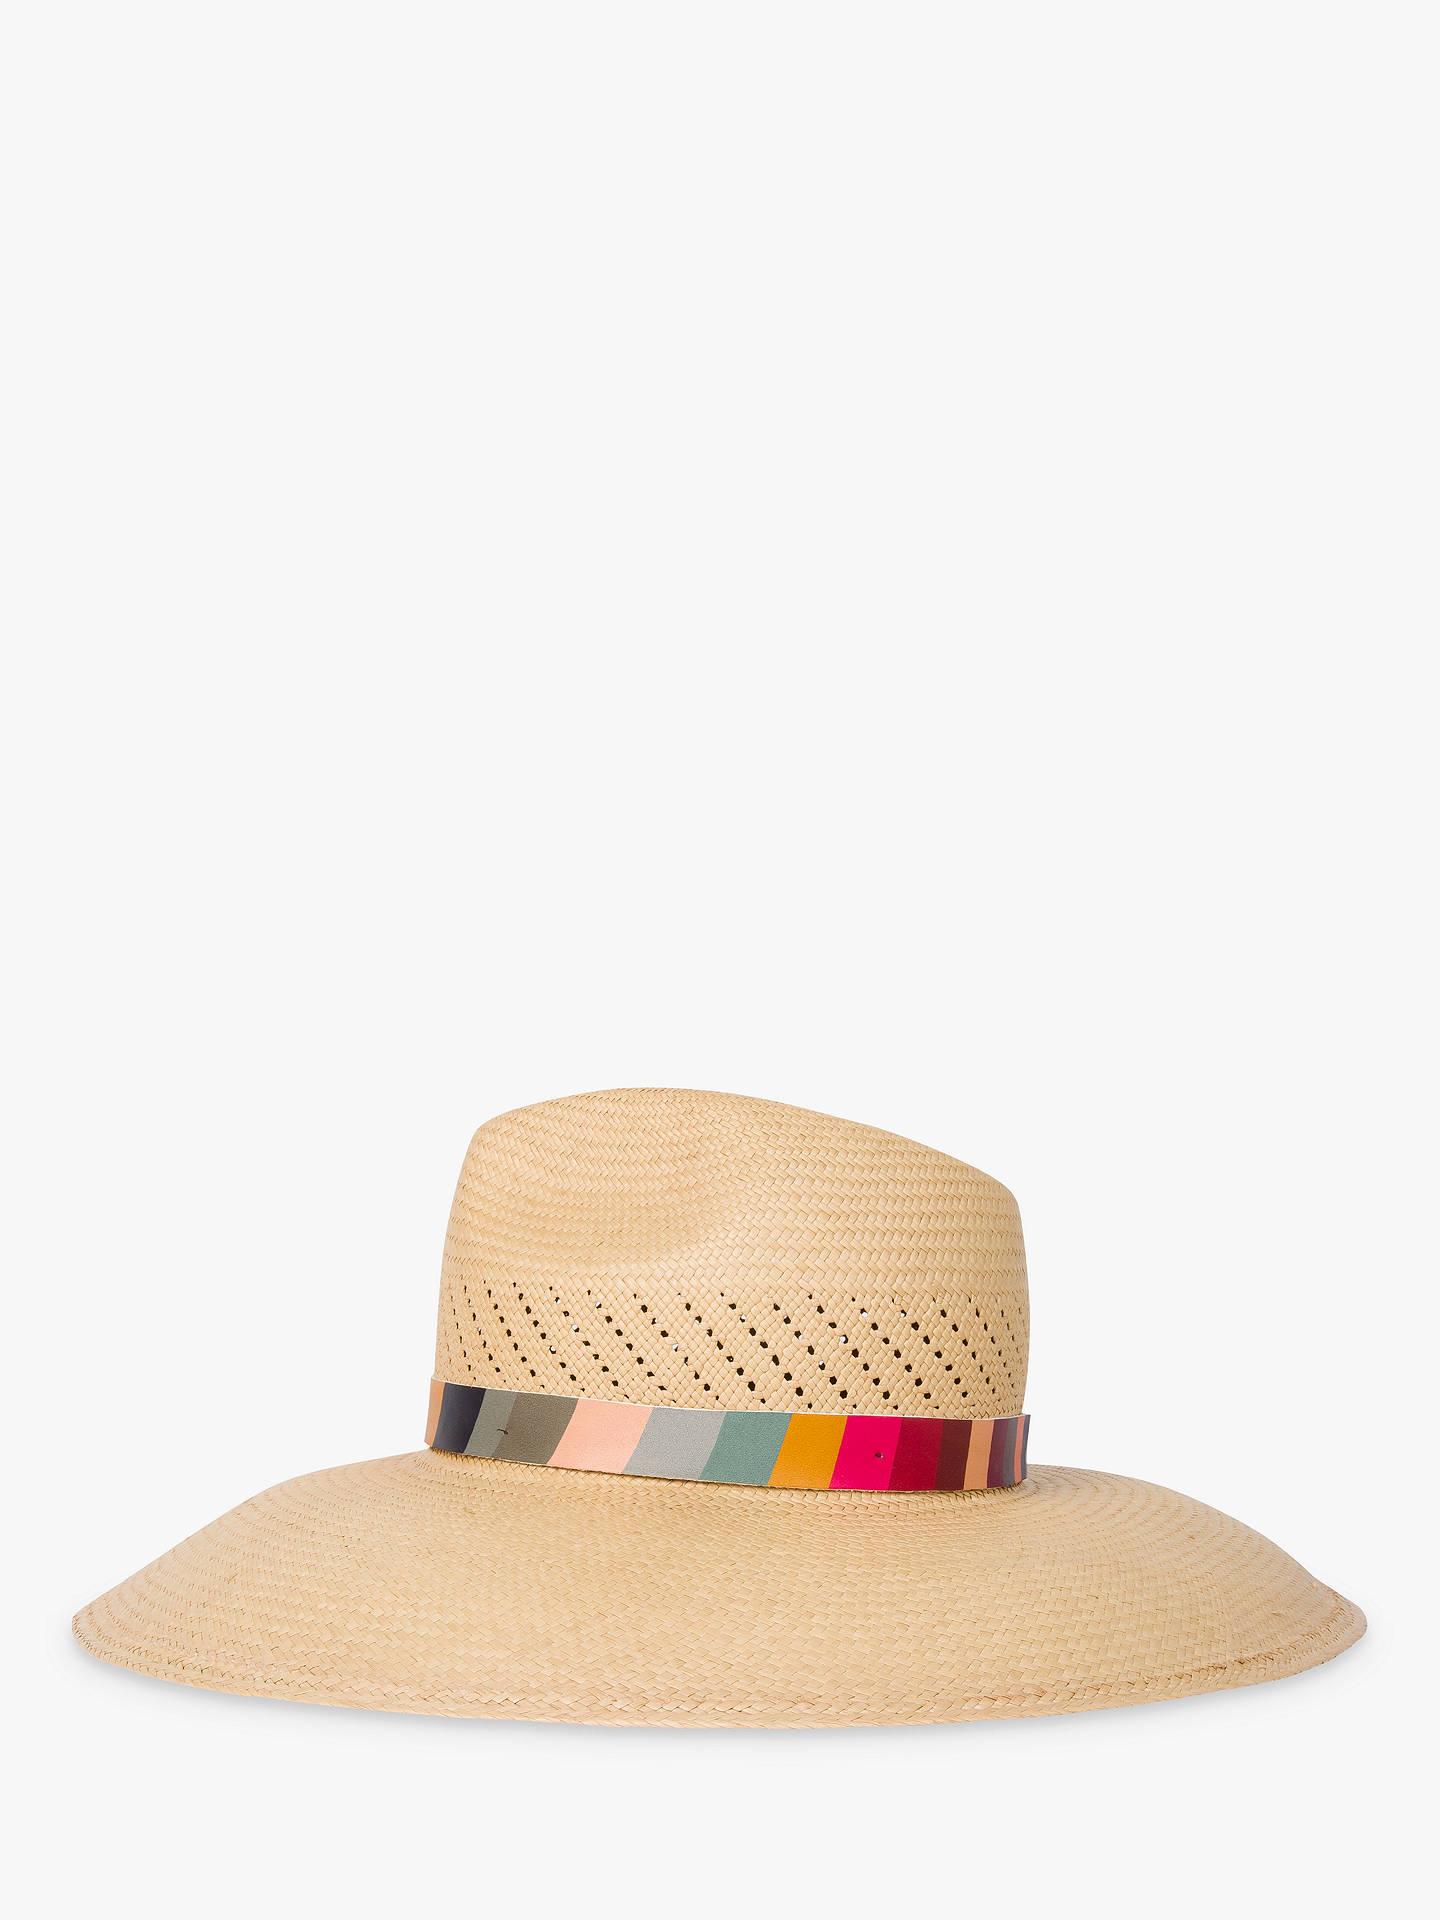 187e30a99 Paul Smith Panama Swirl Crochet Hat, Multi